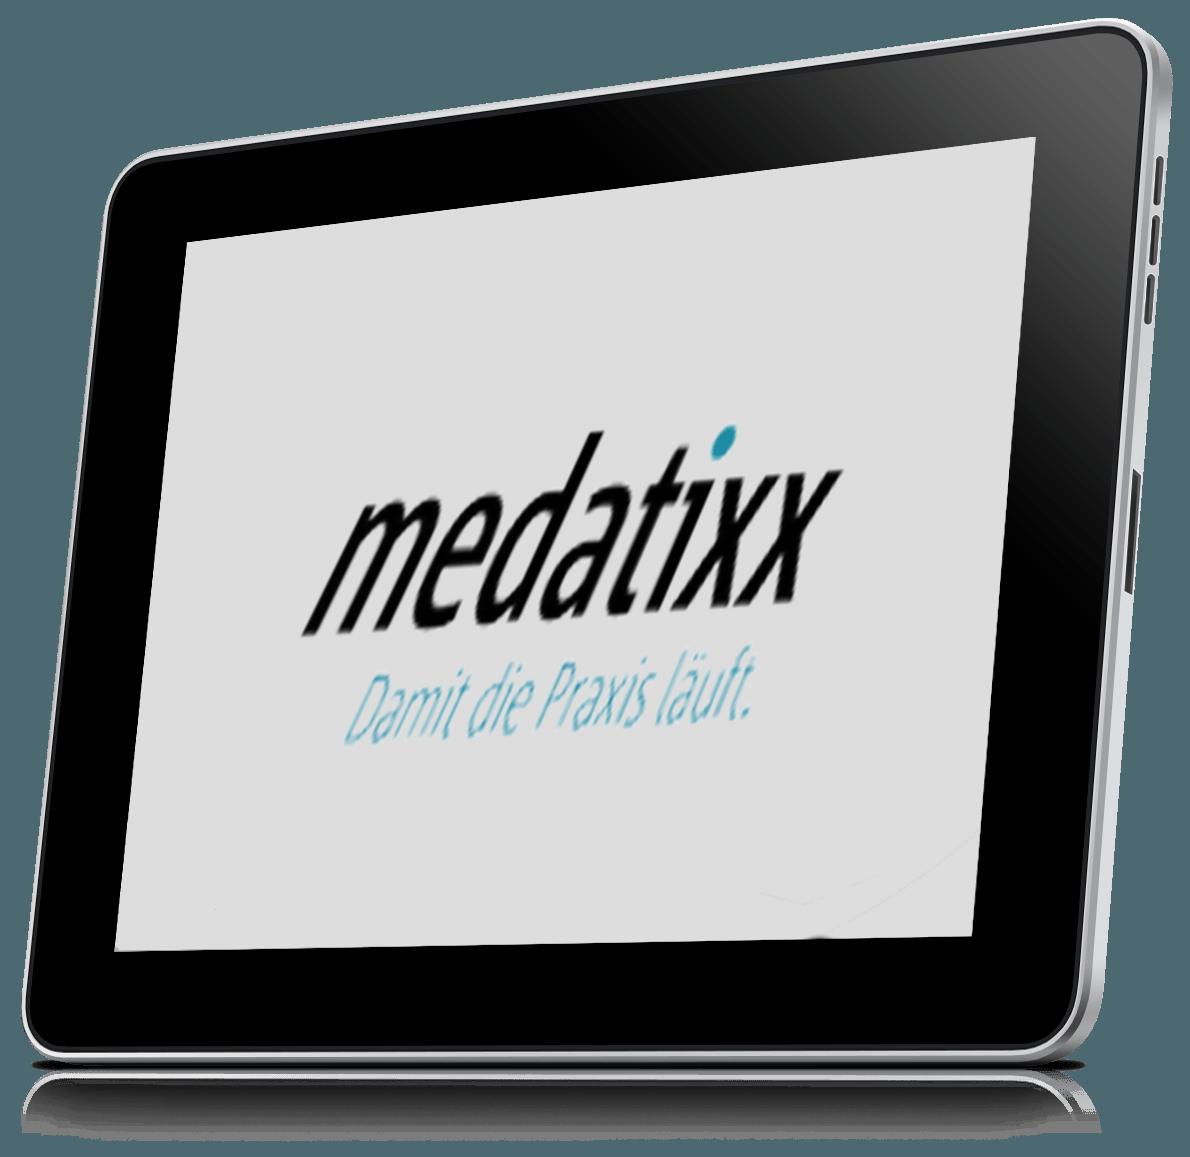 https://www.leadtributor.com/wp-content/uploads/medatixx-blog.png